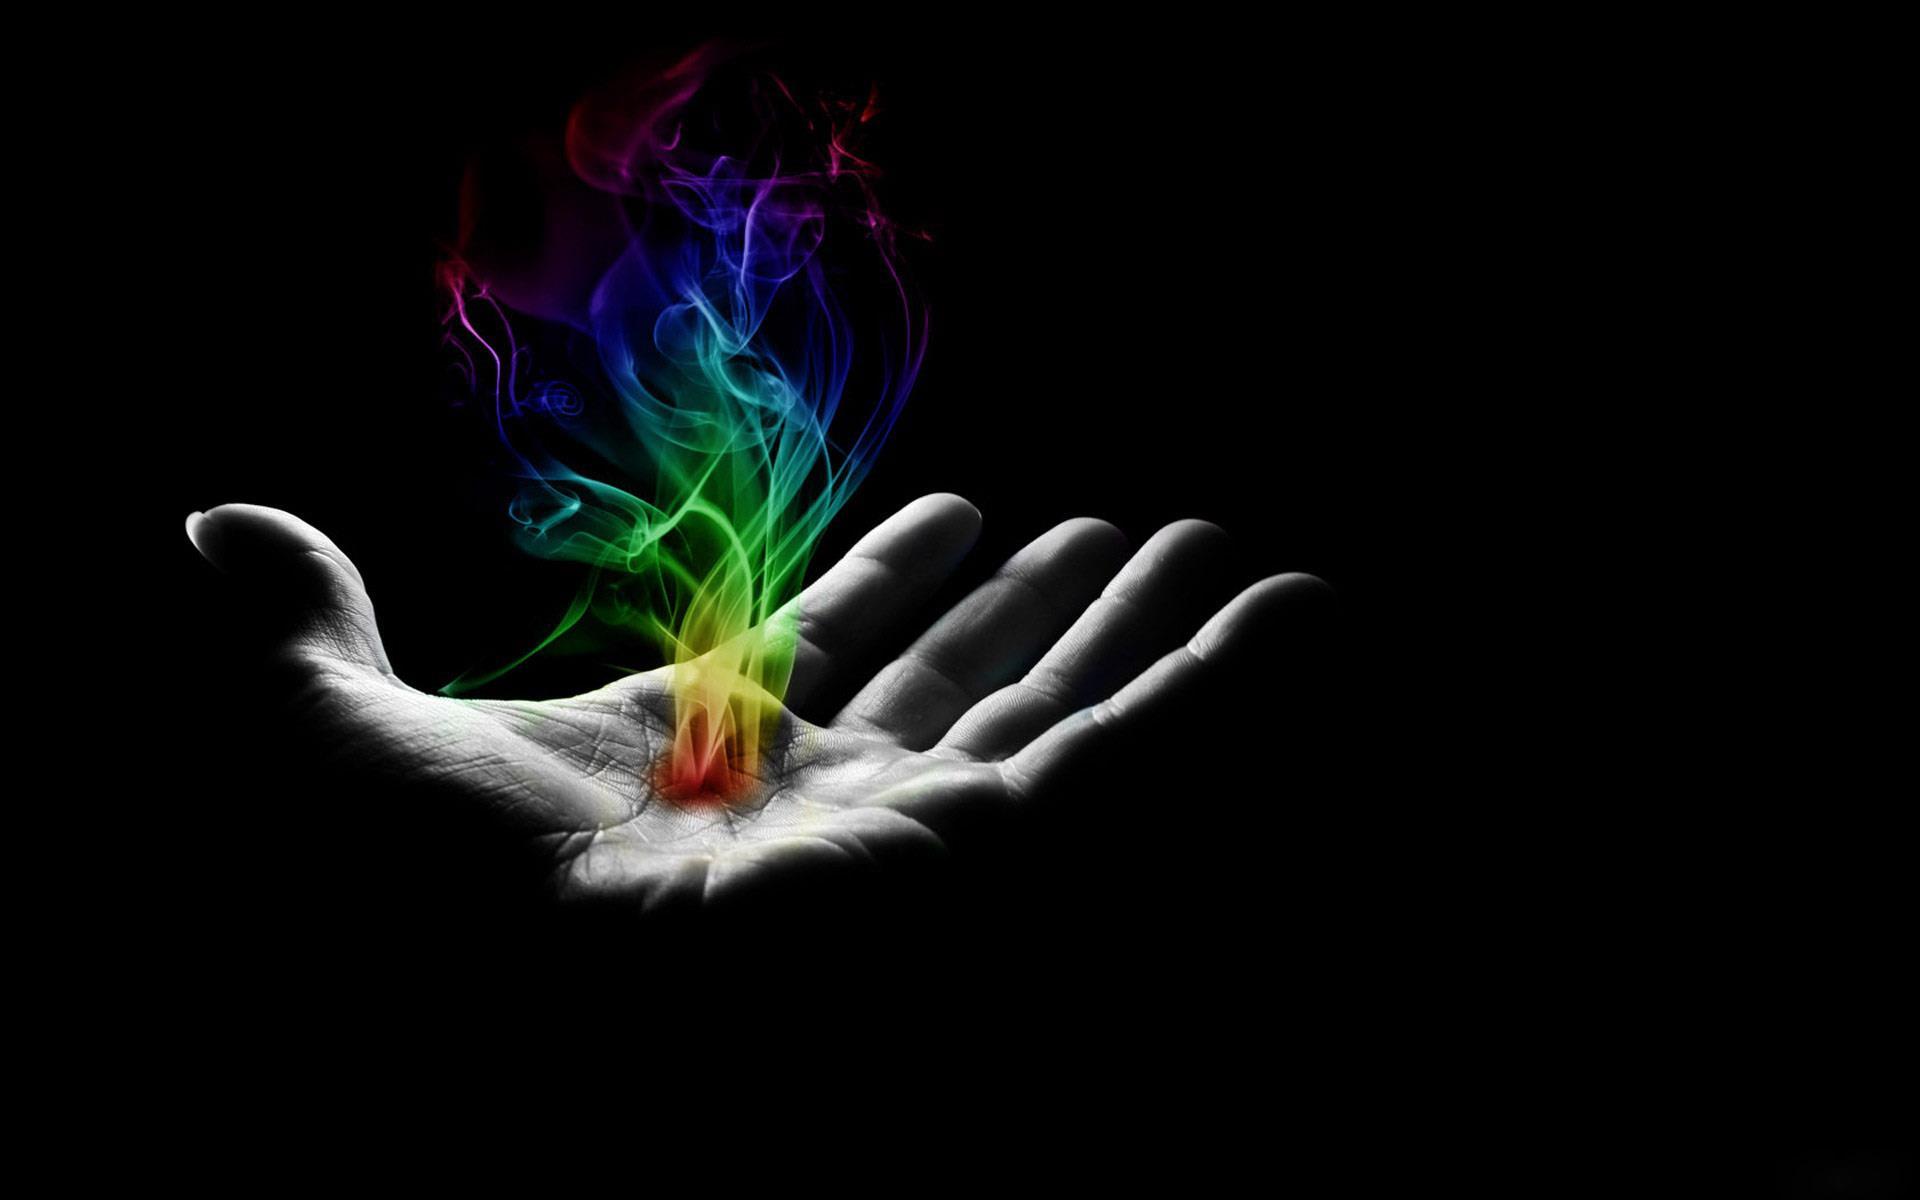 reiki-hand-with-rainbow-fire.jpg